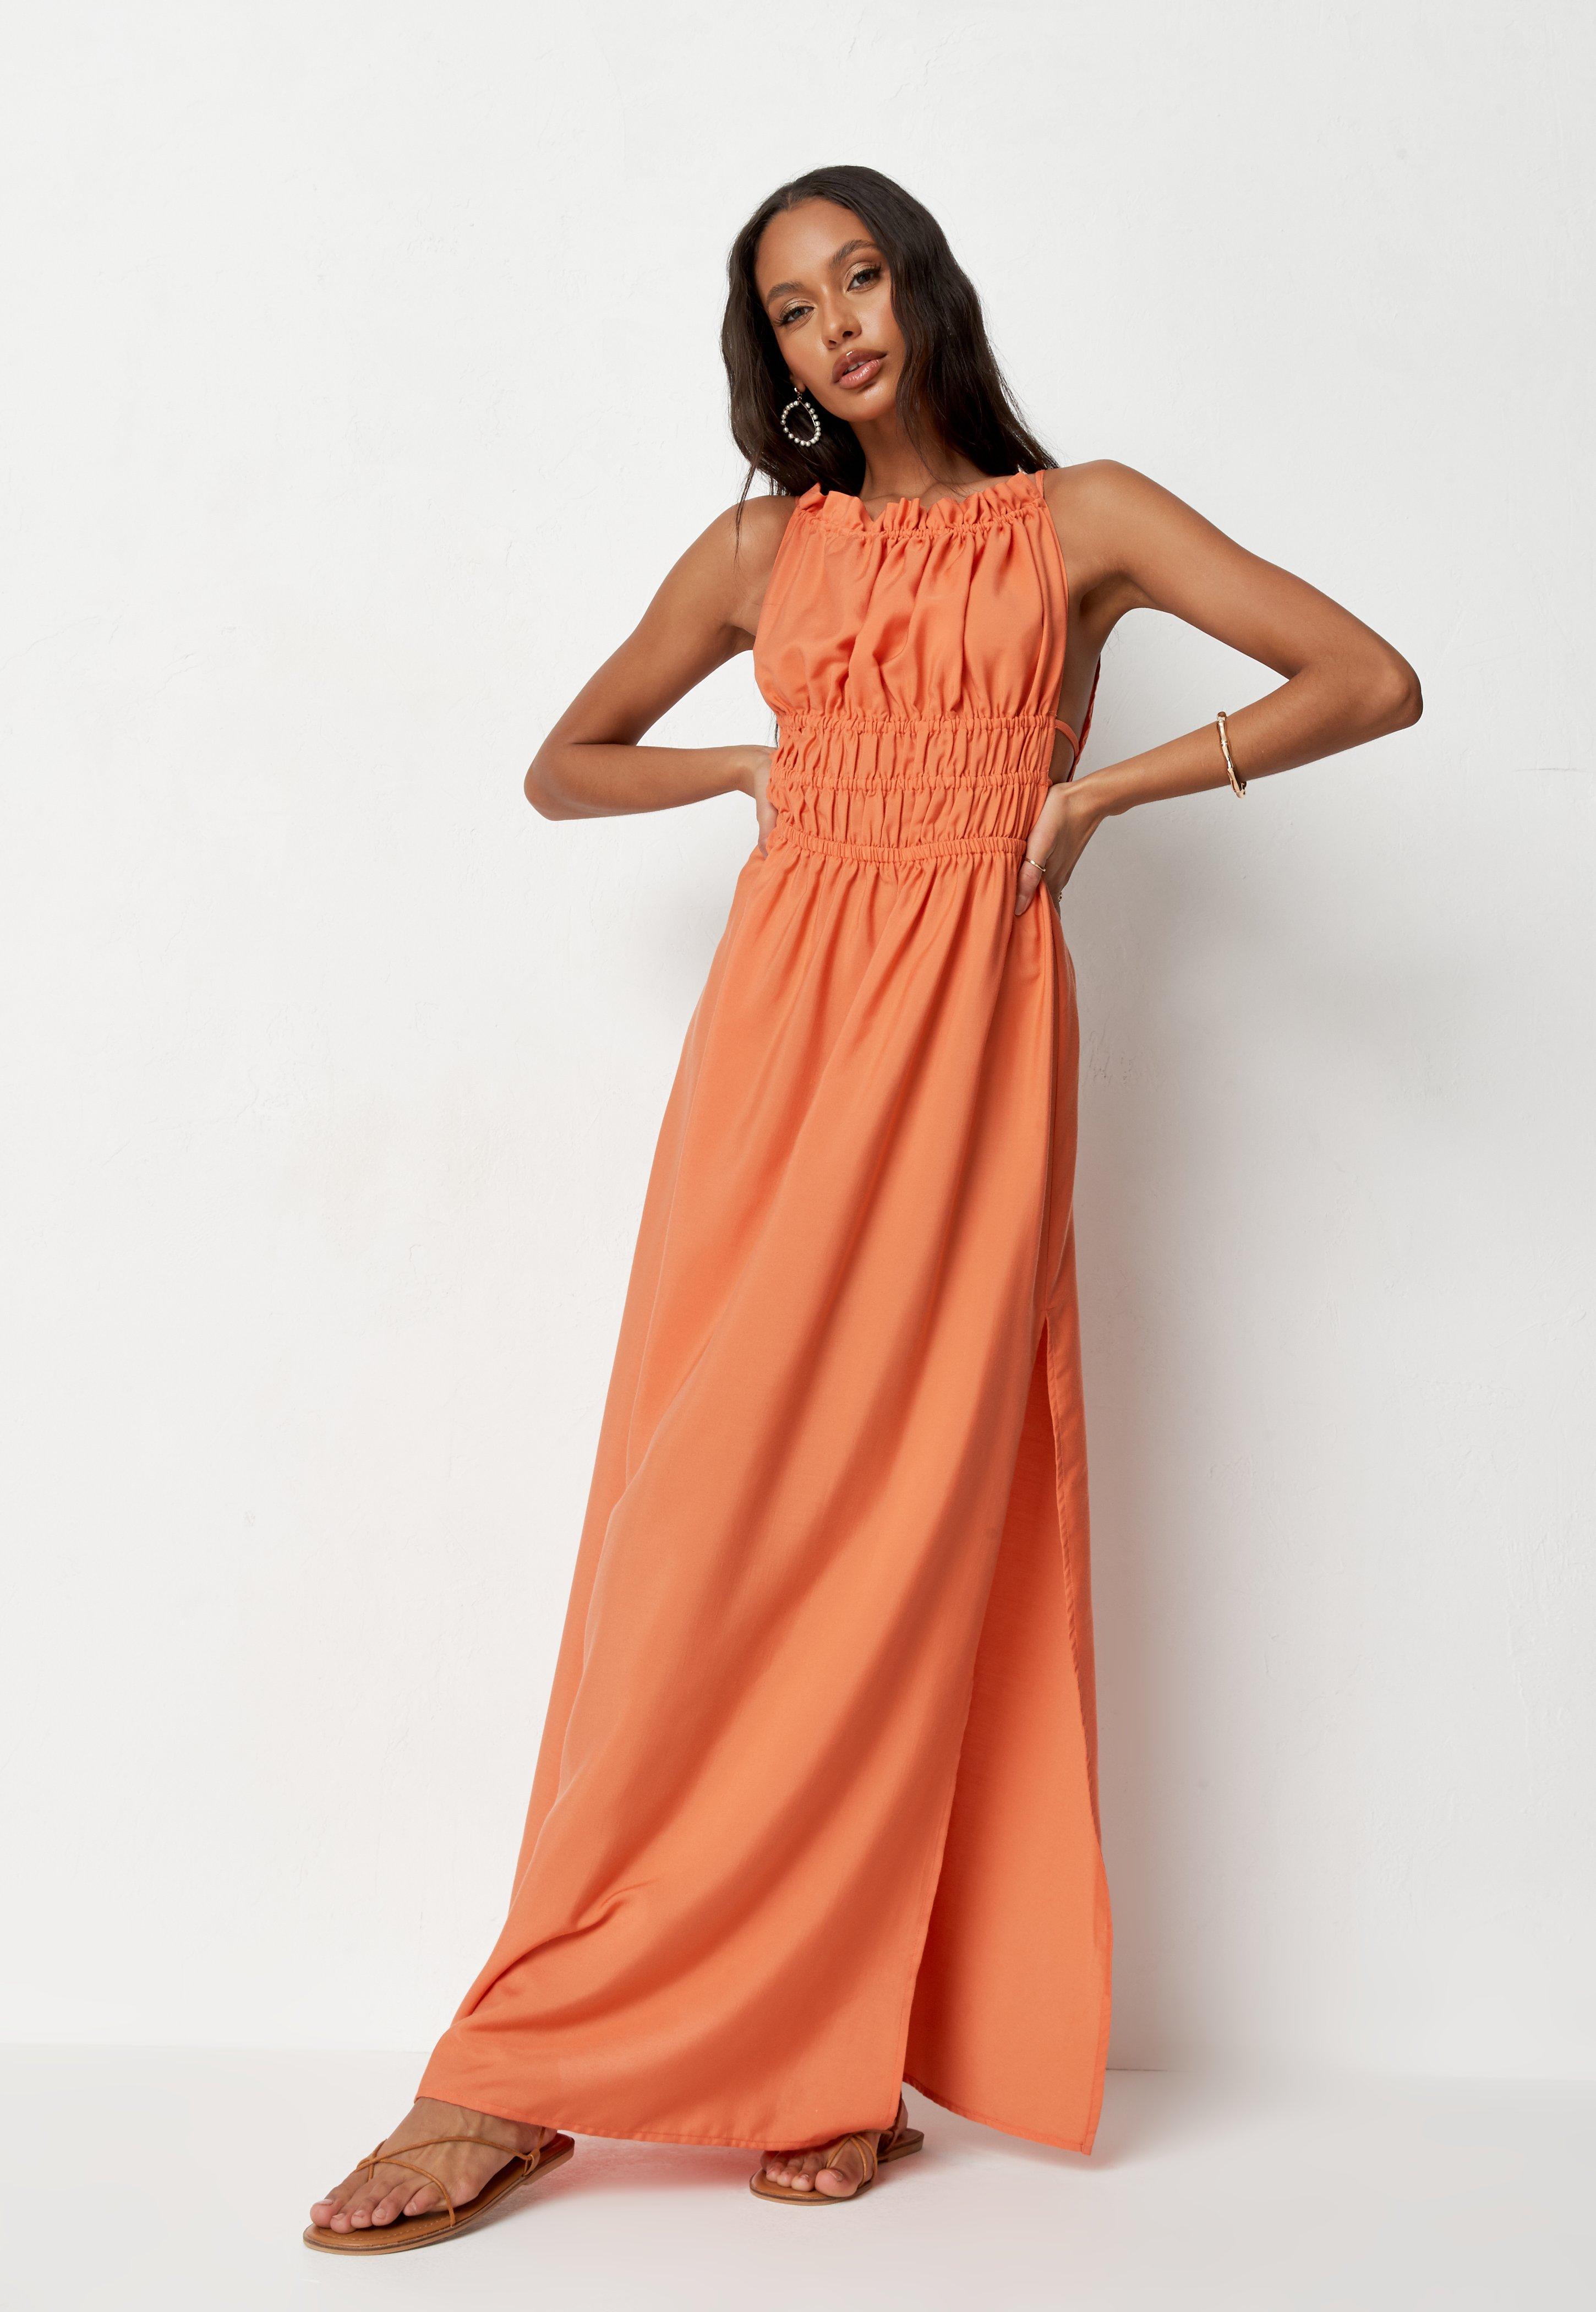 Orange Maxi Dresses, Sleeveless Maxi Dress,Sleeveless Maxi Dress,Sleeveless Maxi Dresses,Sleeveless Maxi Dress,Orange Maxi Dresses,Orange Maxi Dress,Orange Maxi Dress,orange maxi dress,orange maxi dress,